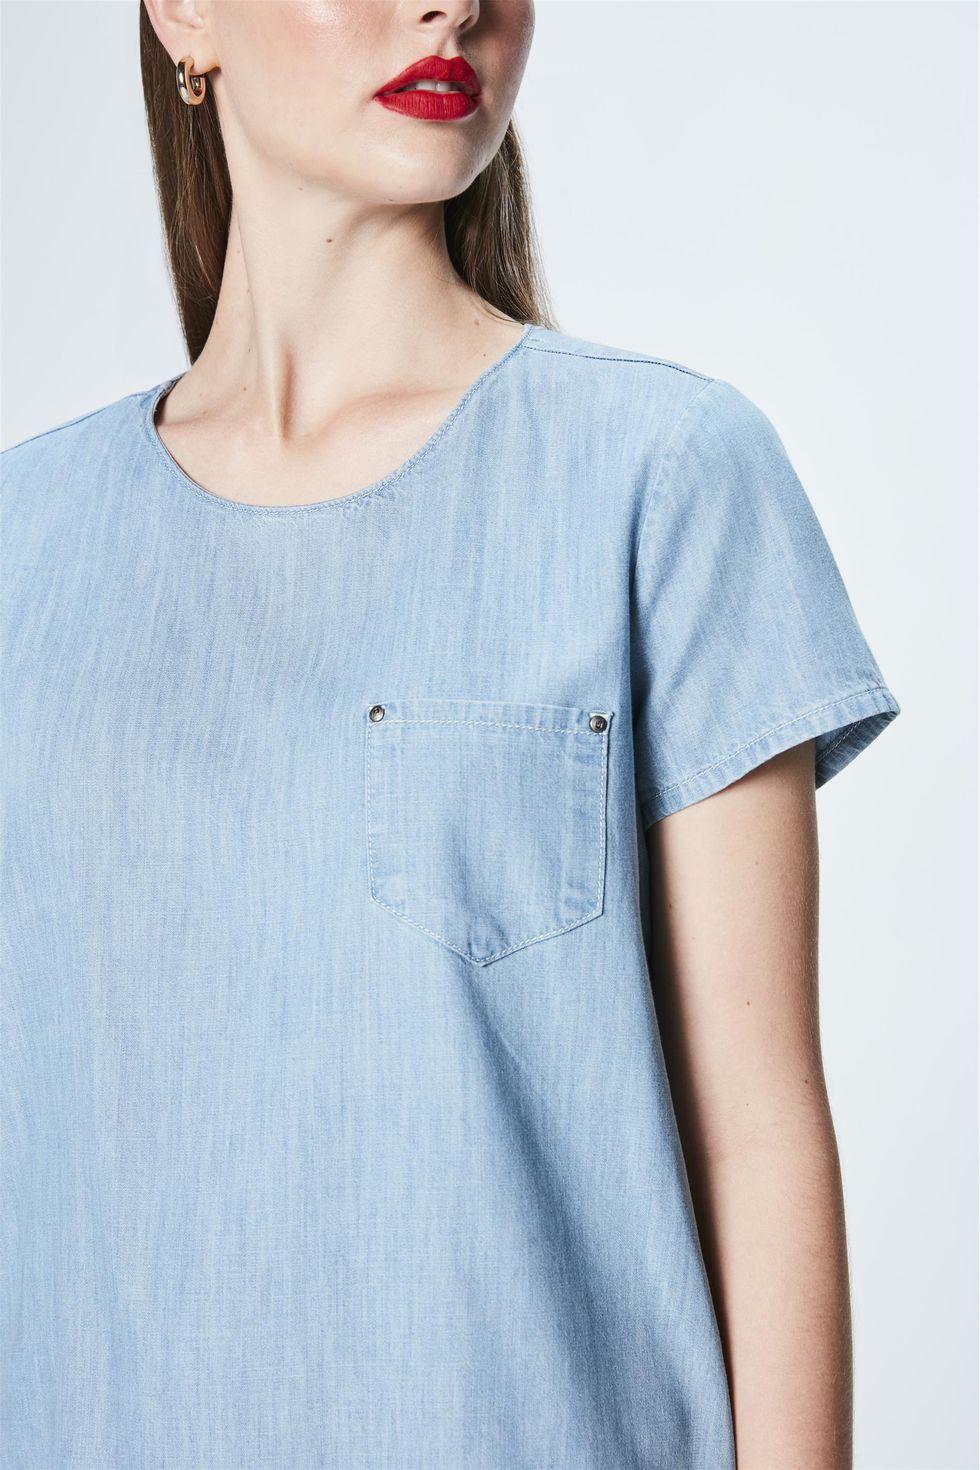 Camiseta-Jeans-Feminina-Frente--